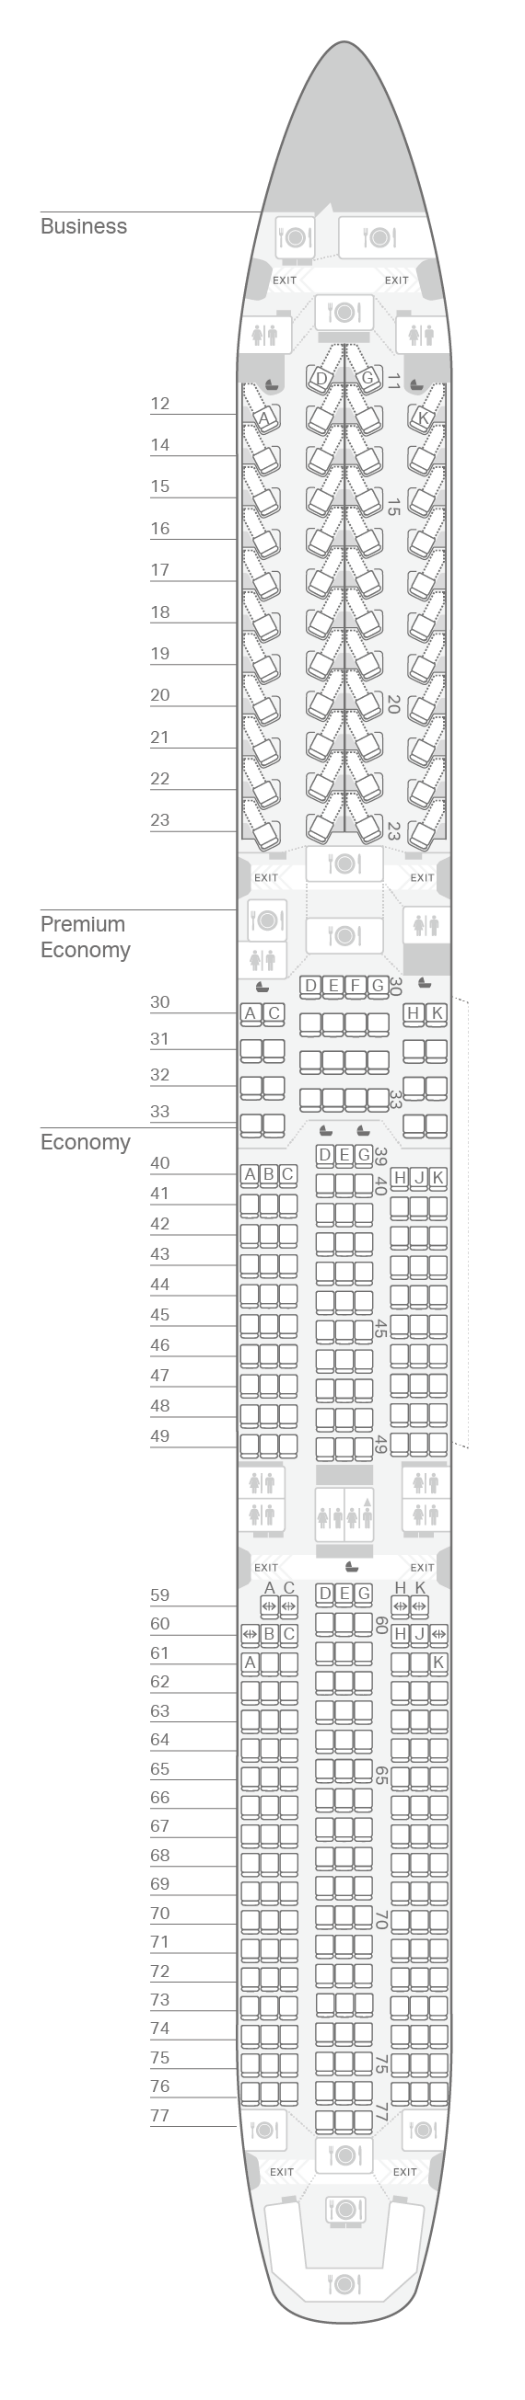 Mappa dei posti Airbus A350-1000